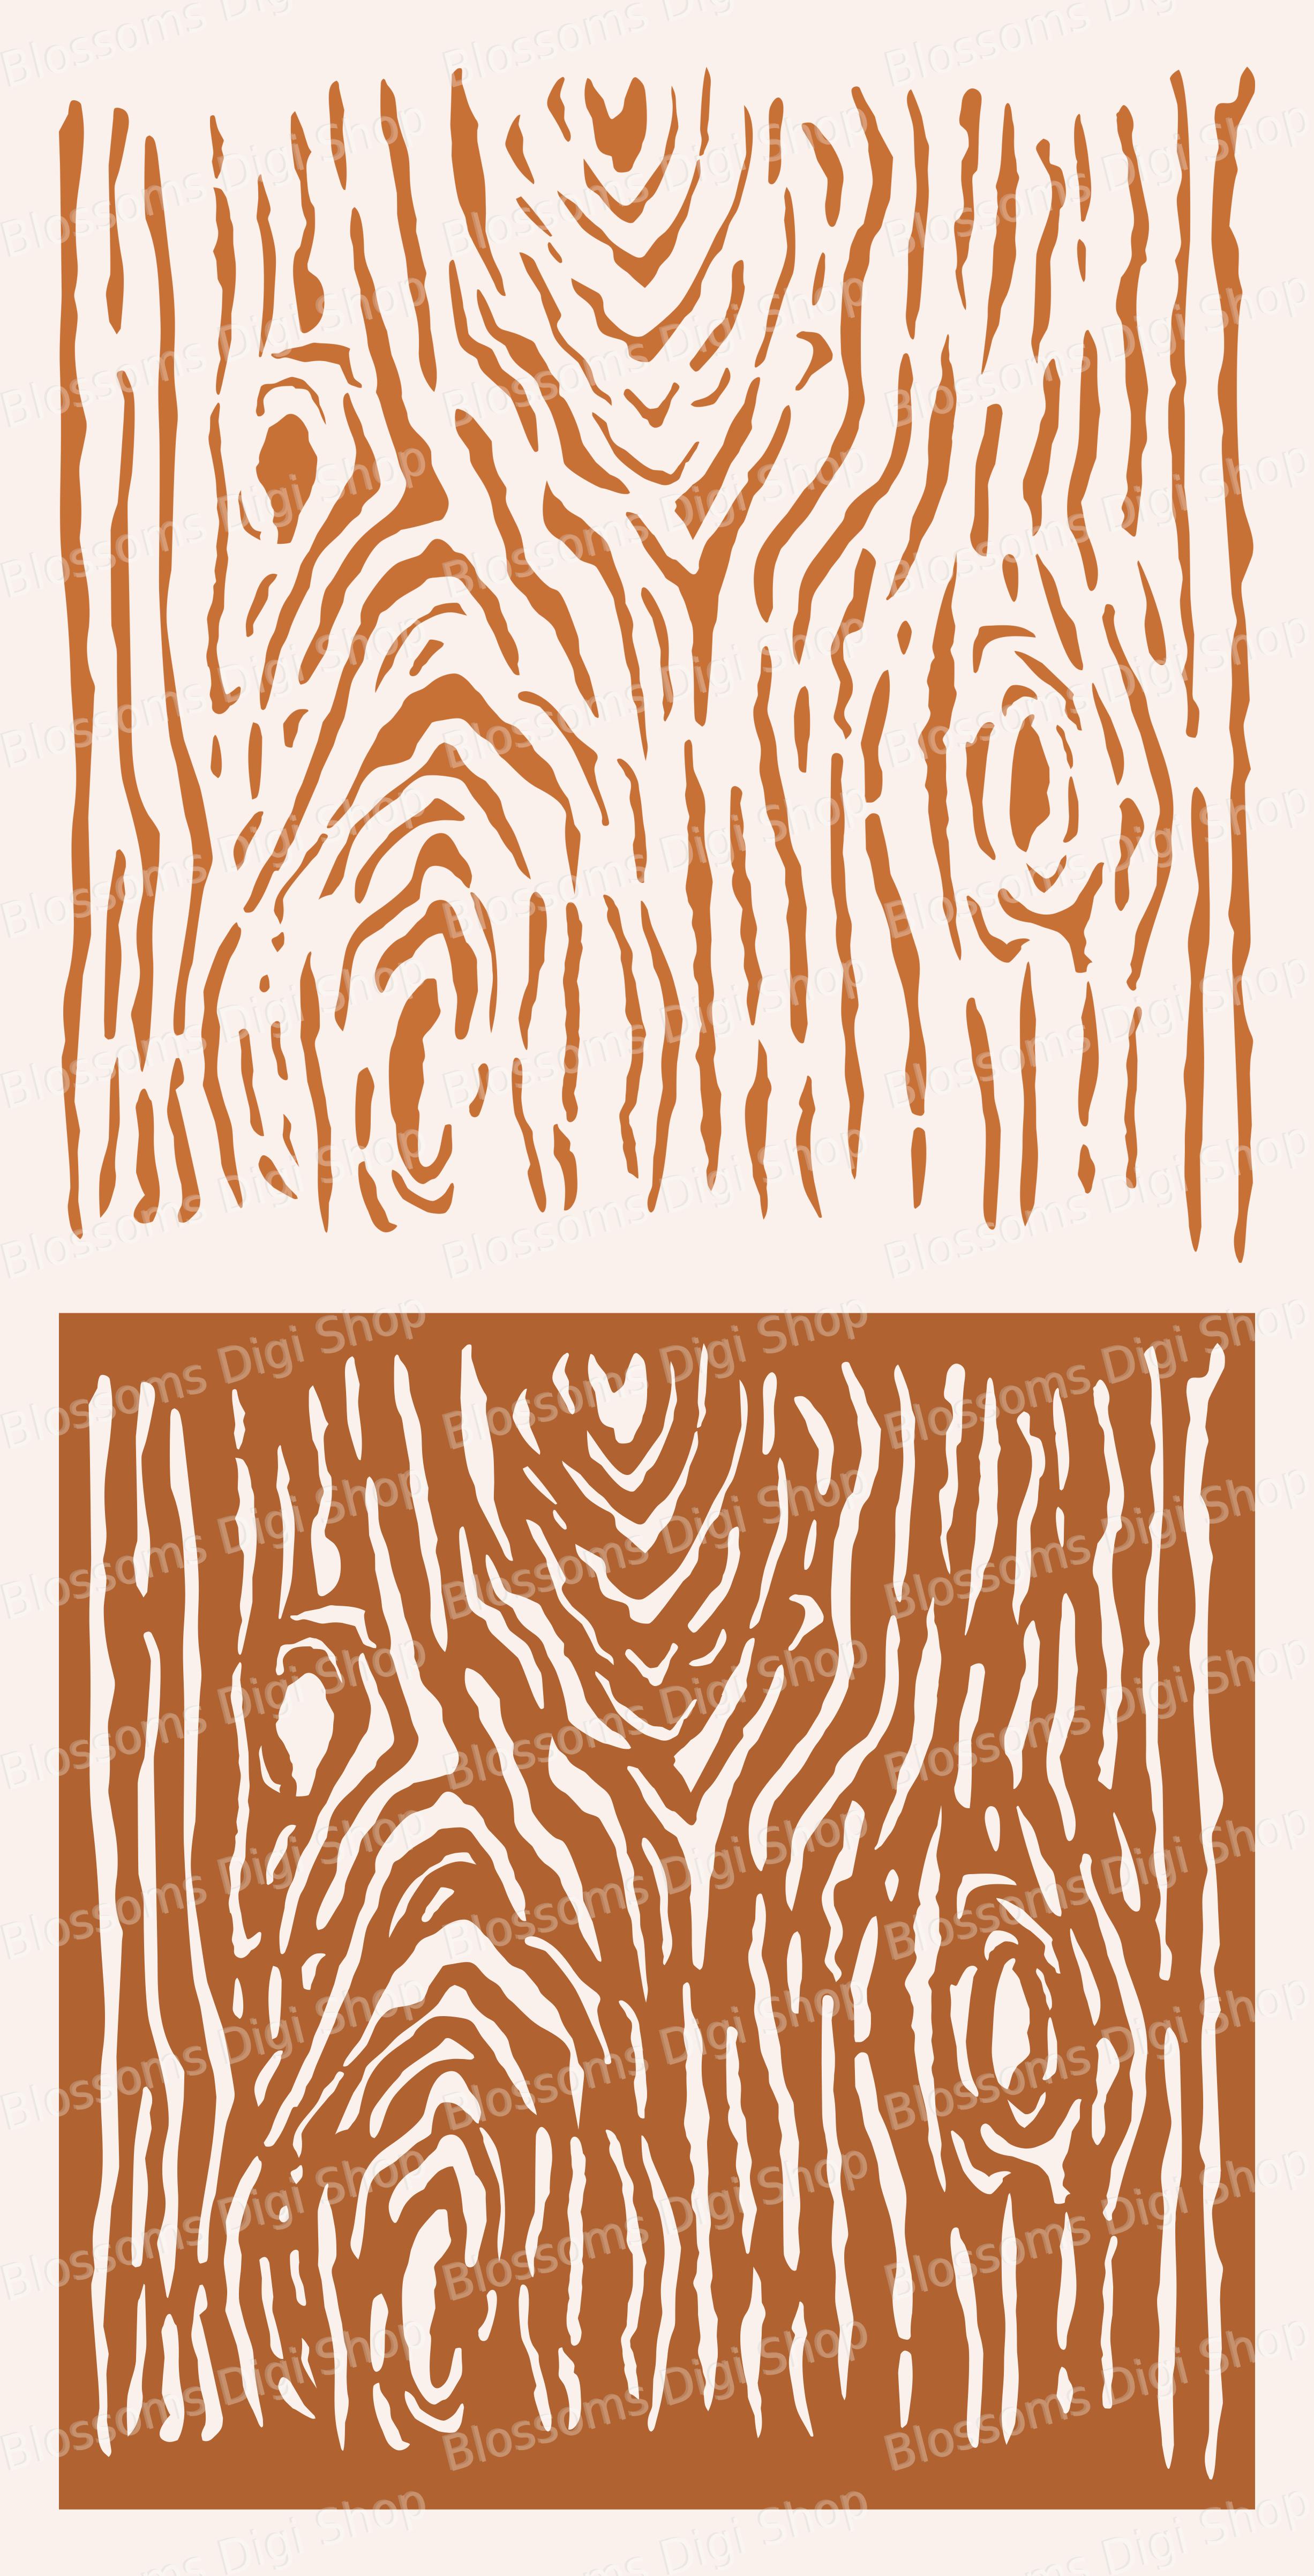 Wood bark clipart clipart royalty free stock Woodgrain stencil svg, digital download, eps file, wood ... clipart royalty free stock